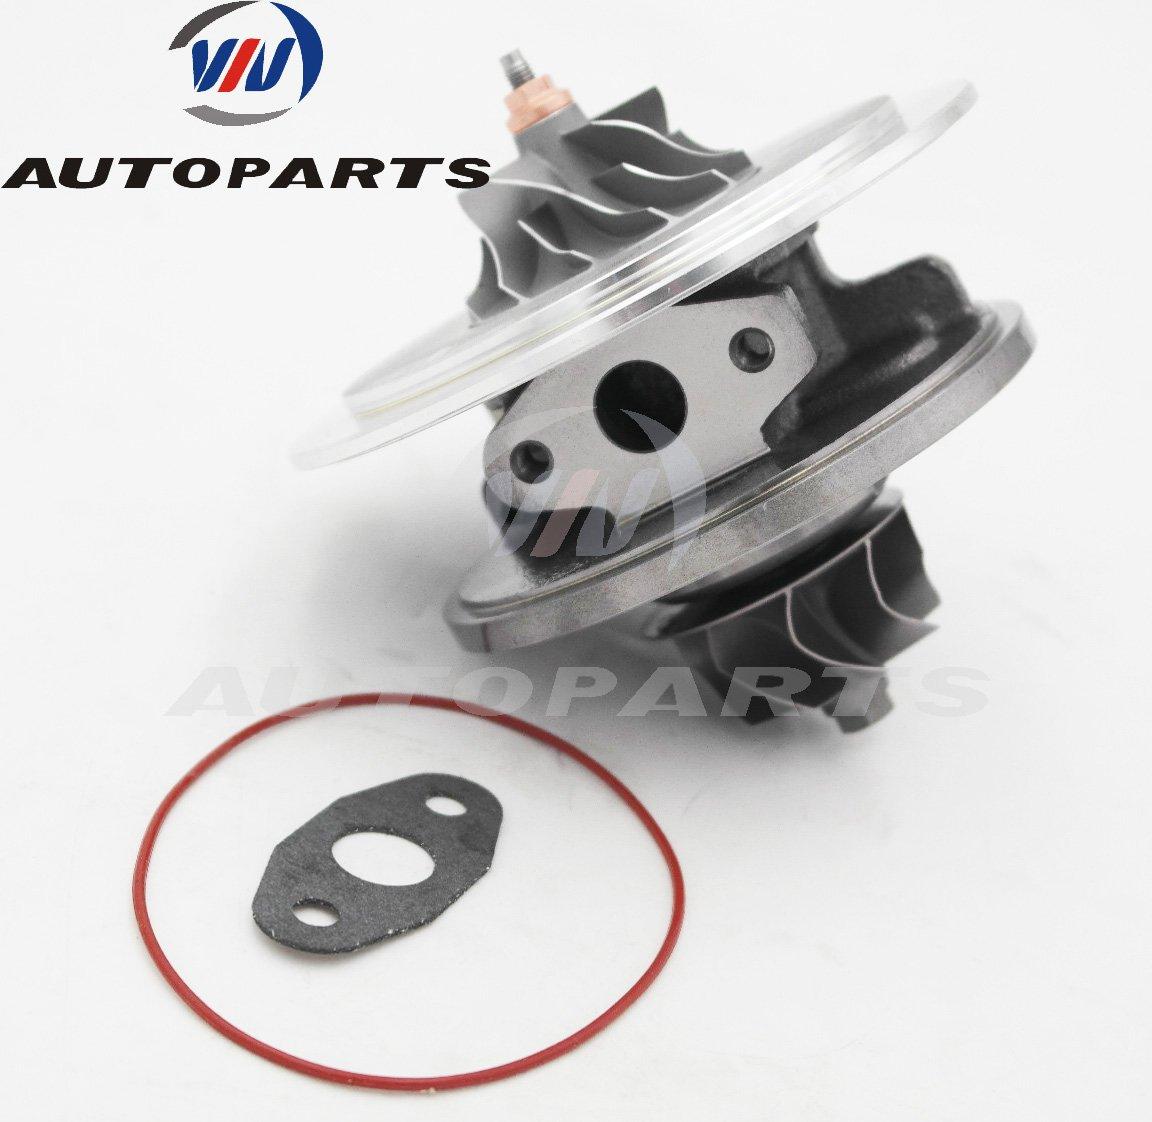 CHRA 703890-0045 for Turbocharger 709836-0001 for Mercedes Benz SPRINTER 413 CDI, E220 CDI 2.2L Diesel Engine VIV AUTOPARTS